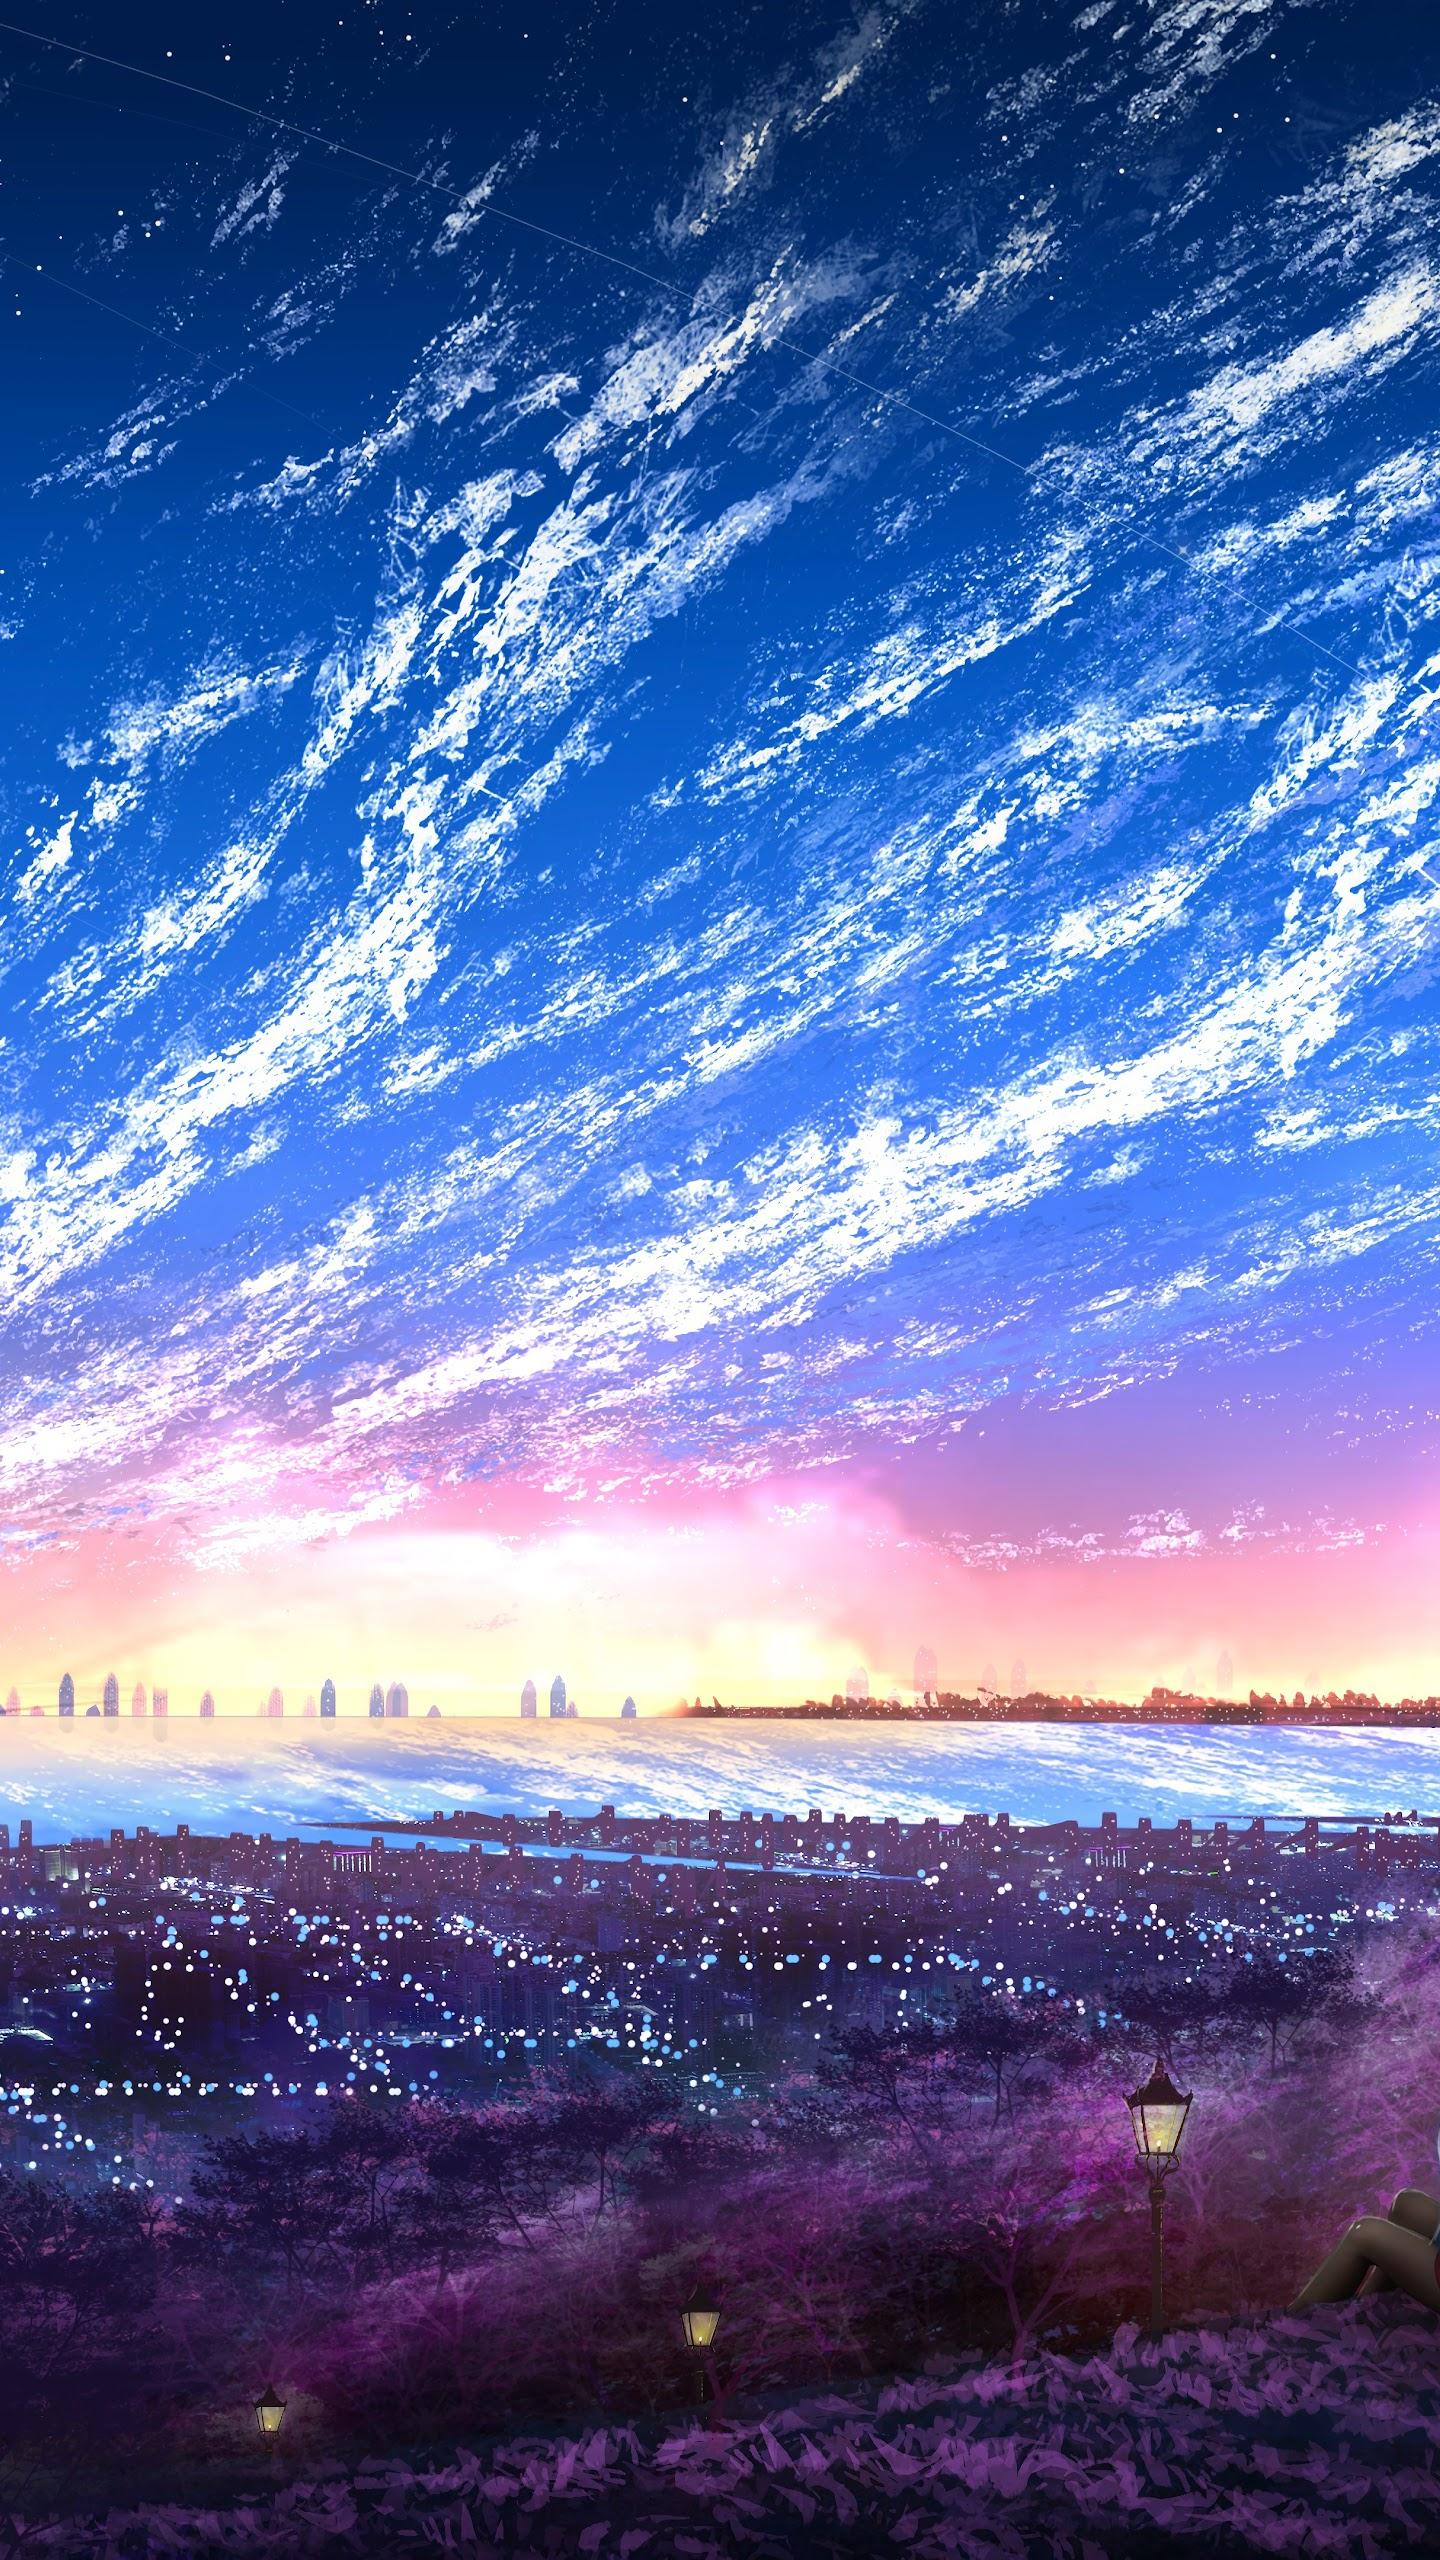 sky city scenery horizon landscape anime uhdpaper.com 8K 131